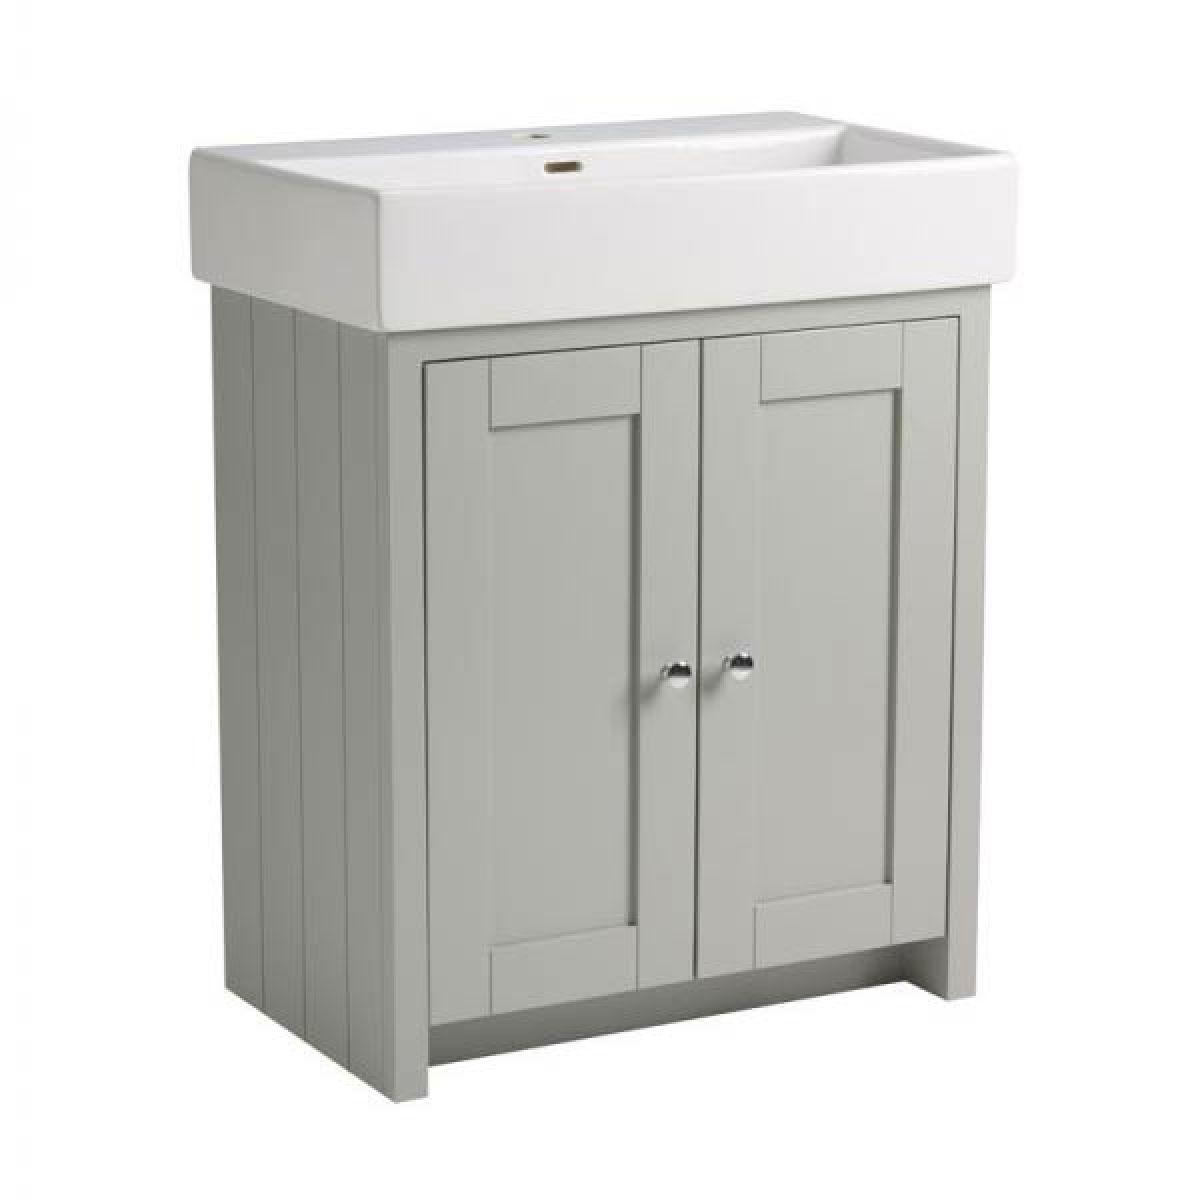 Tavistock Lansdown Pebble Grey Freestanding Vanity Unit 700mm